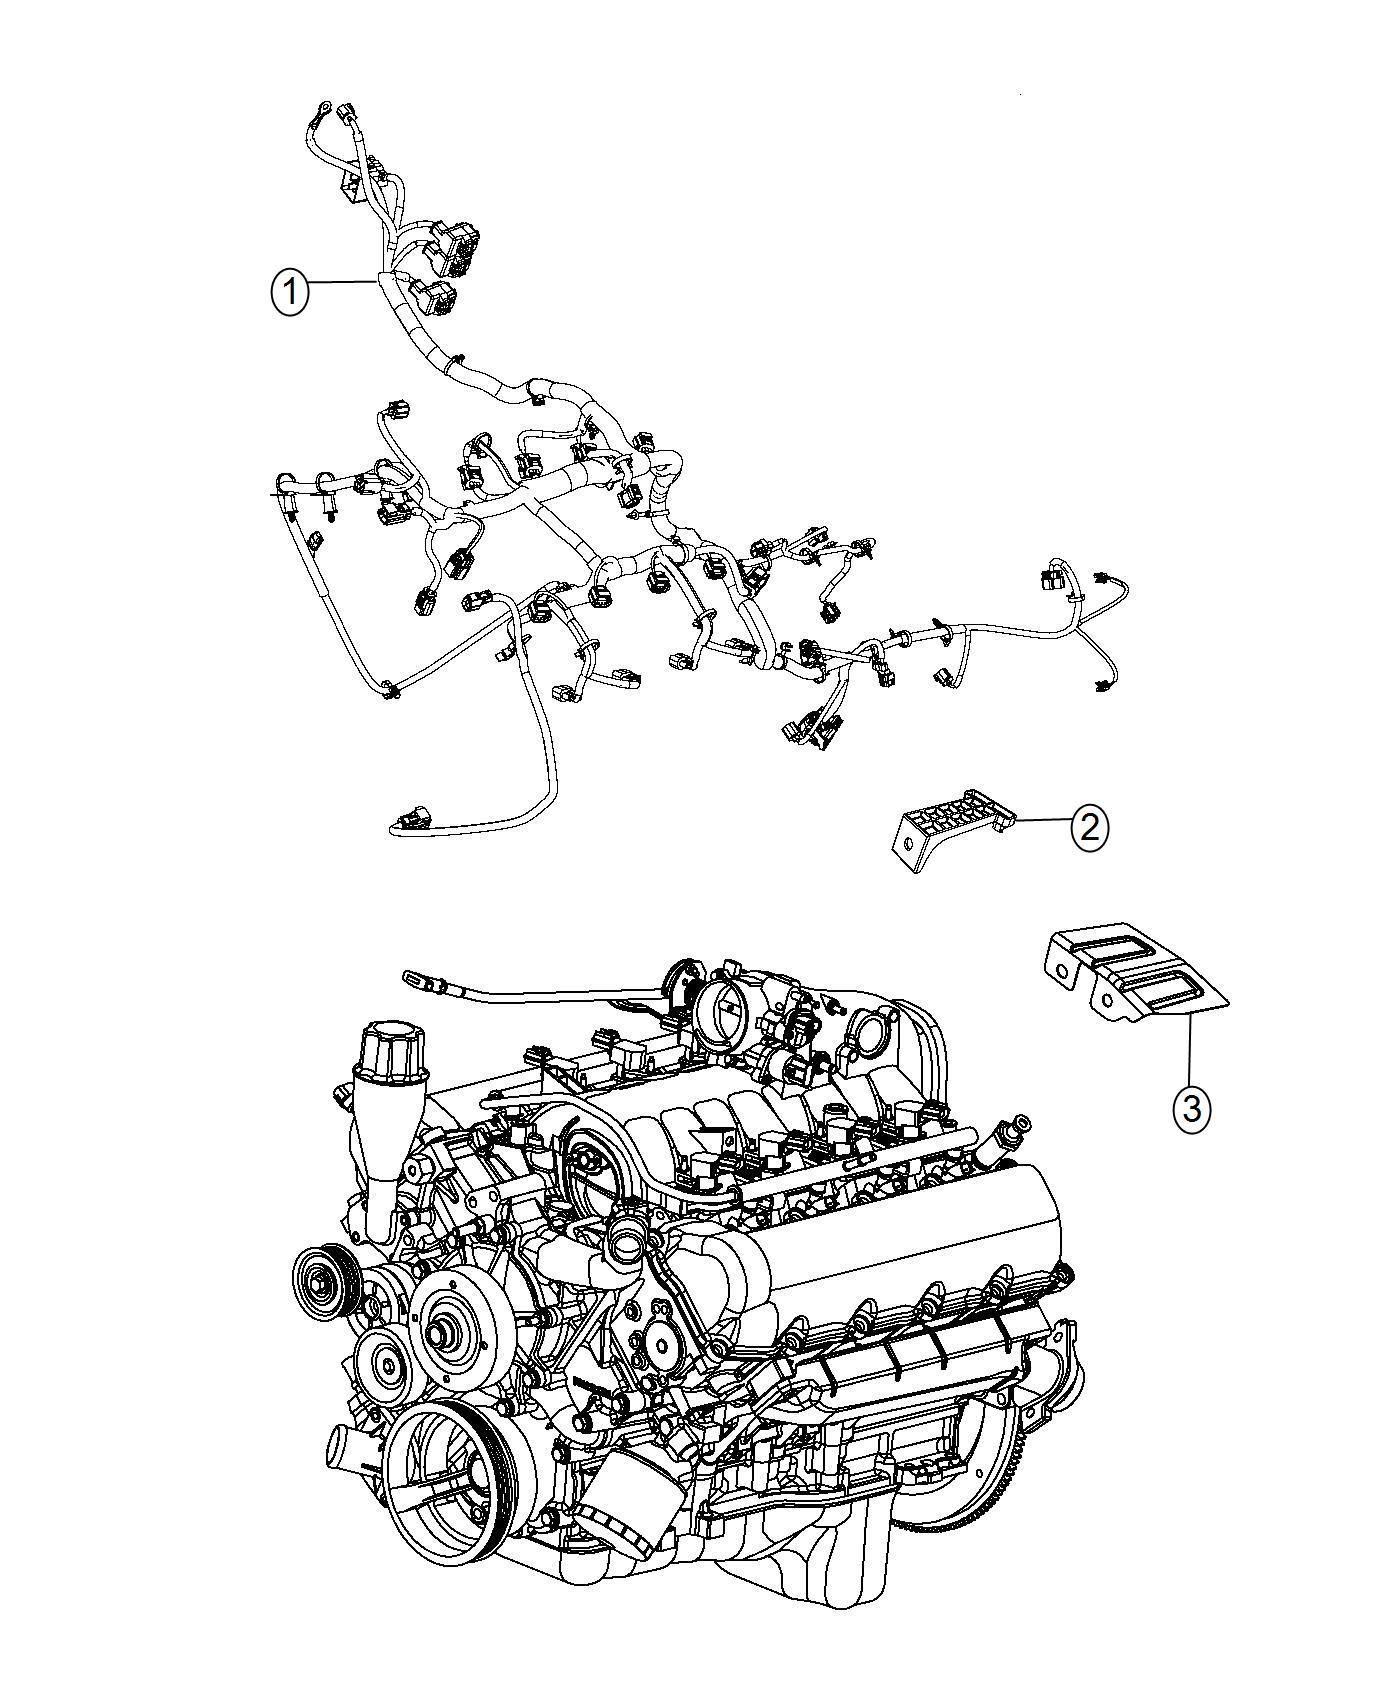 Ram Cord Engine Block Heater Engine Block